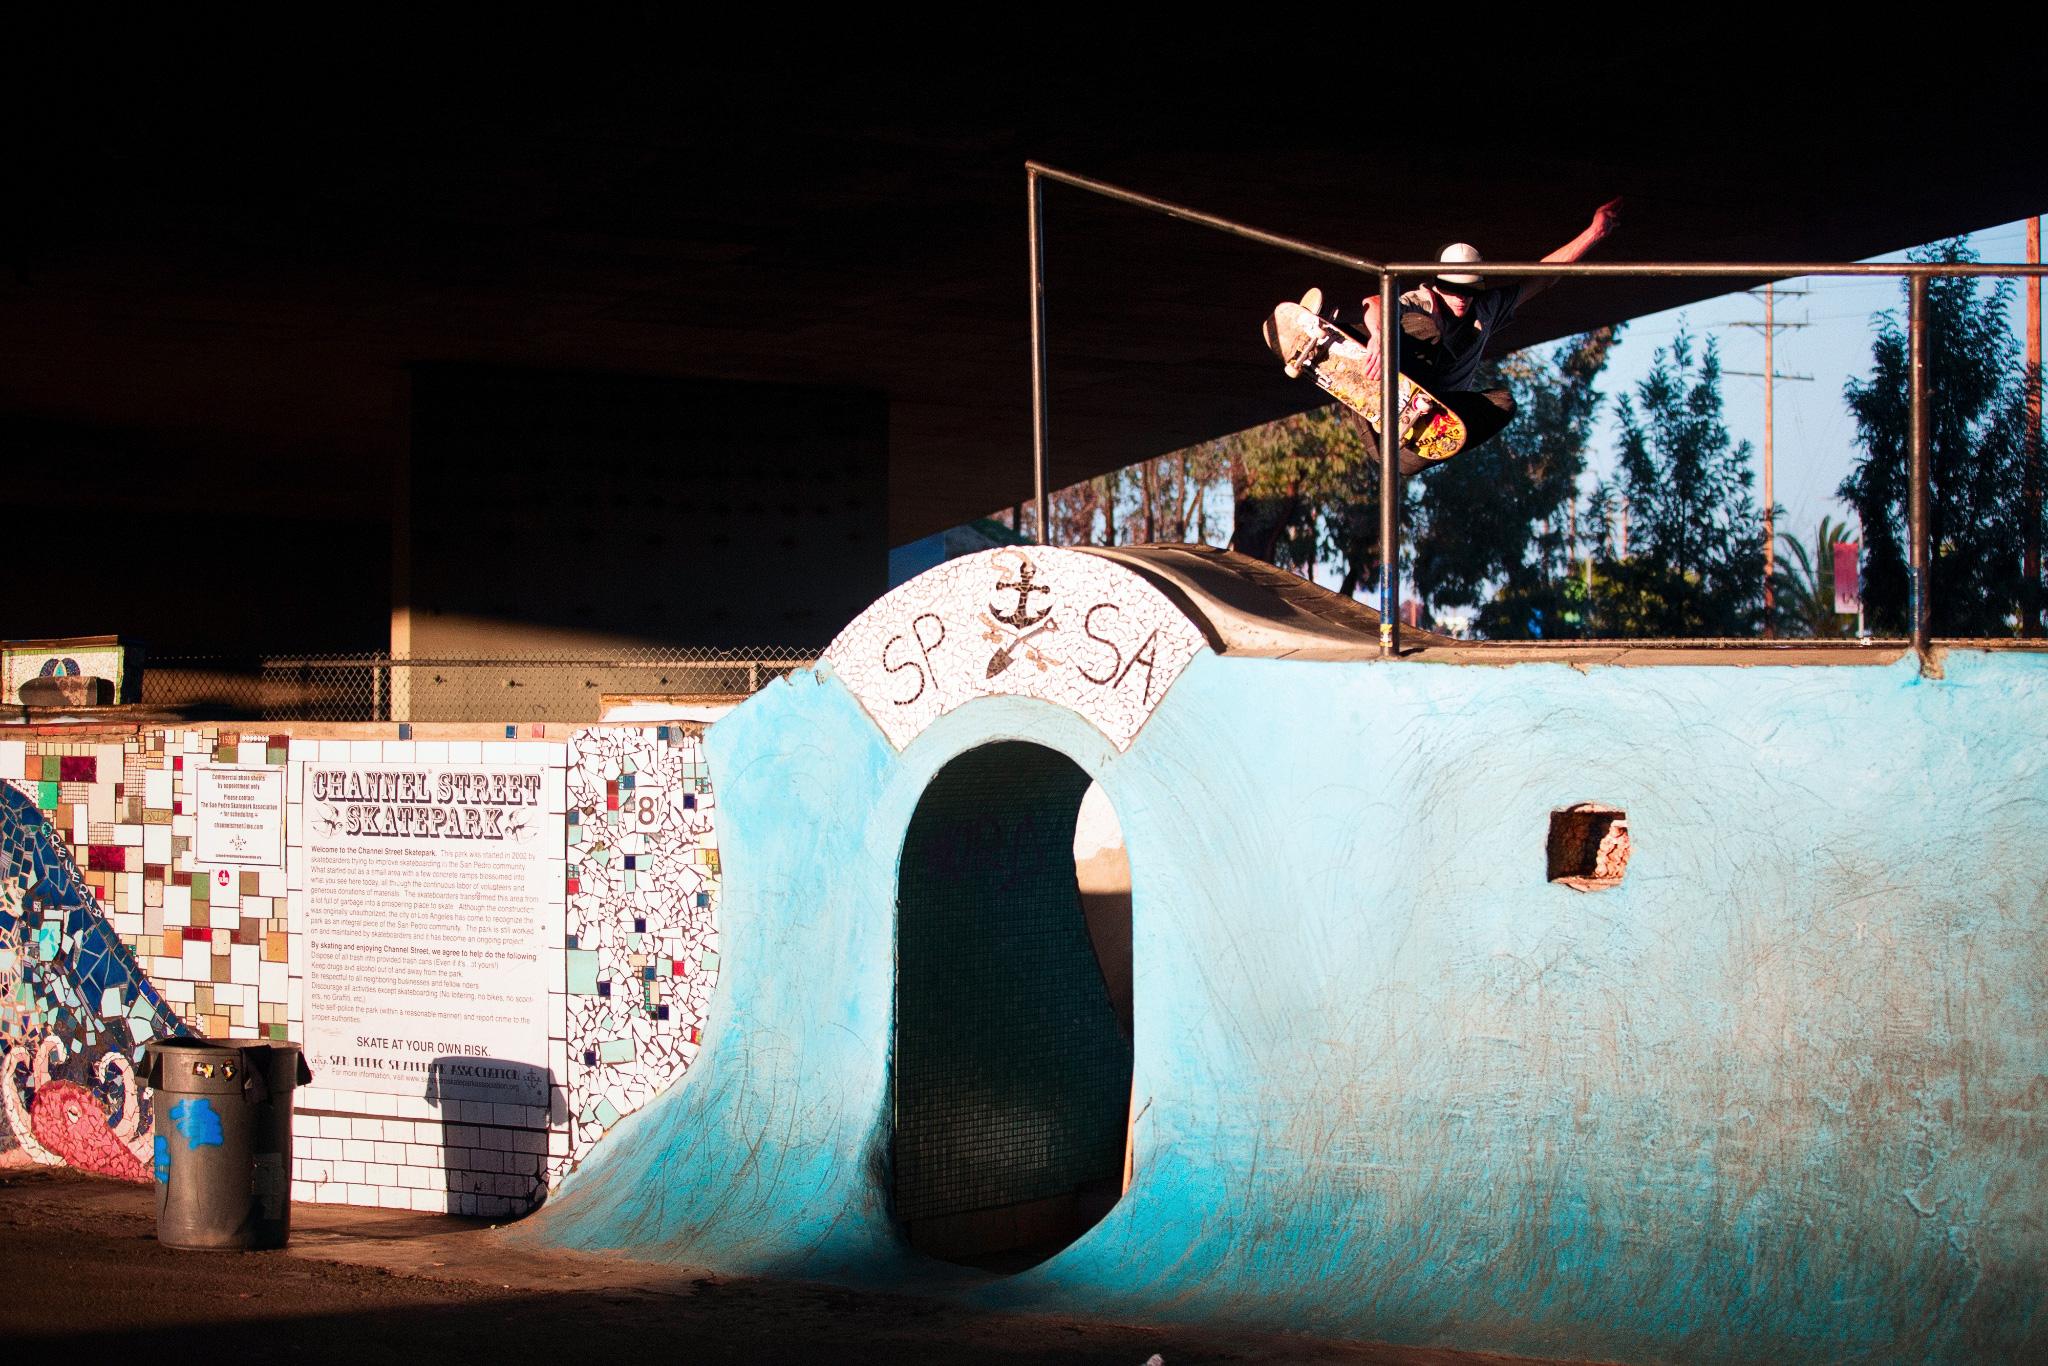 Shaun Ross, San Pedro, Calif.